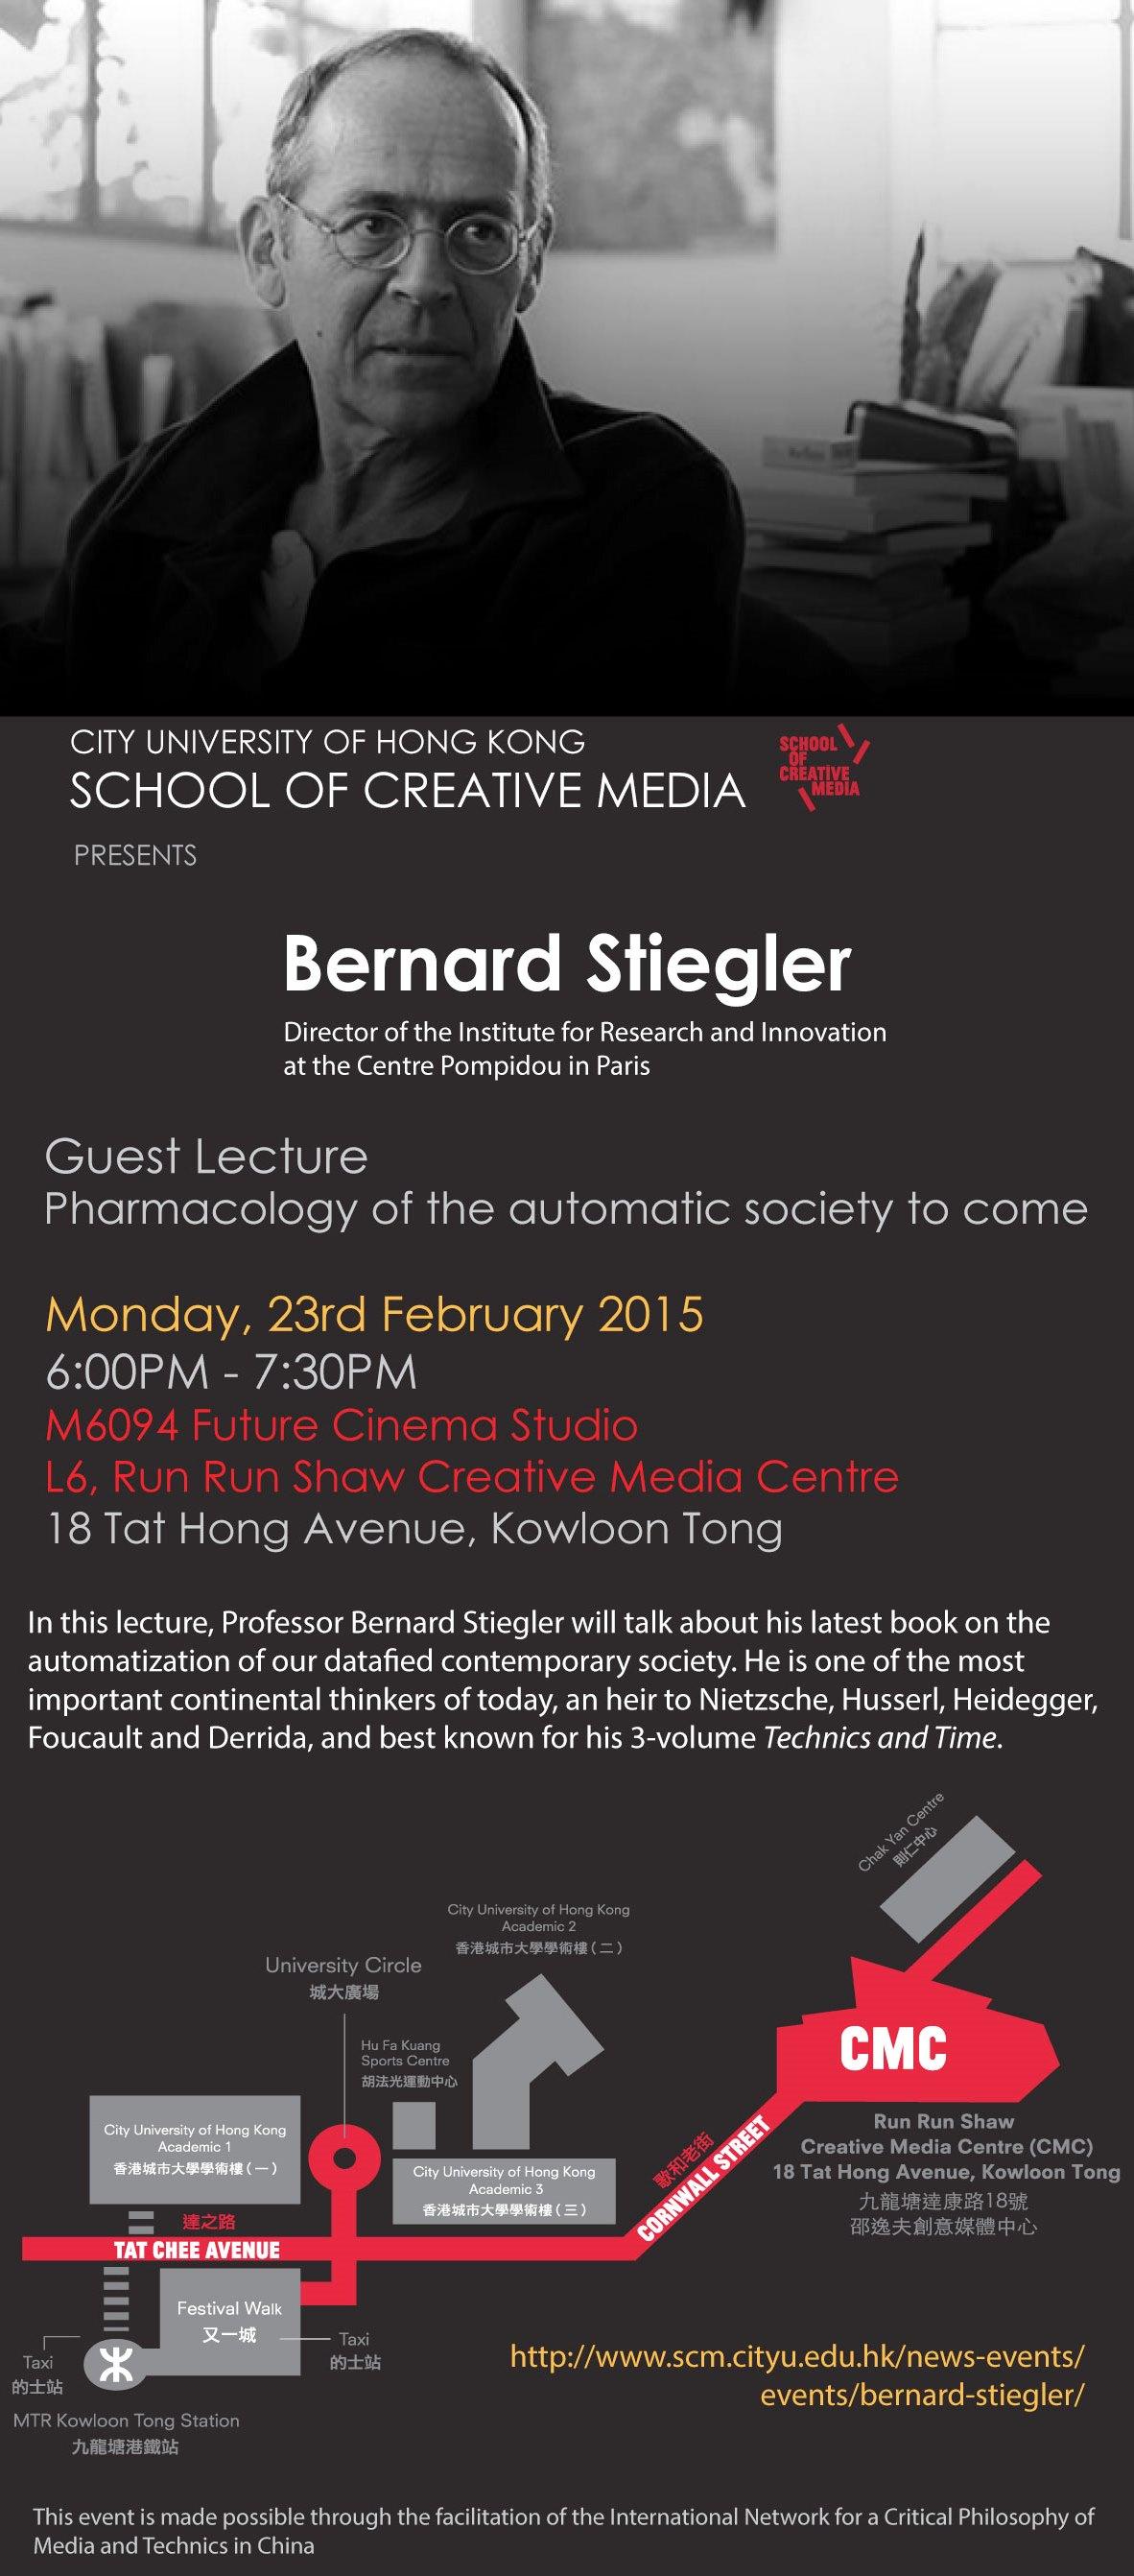 Bernard Stiegler 香港城市大學講座(2月23日)